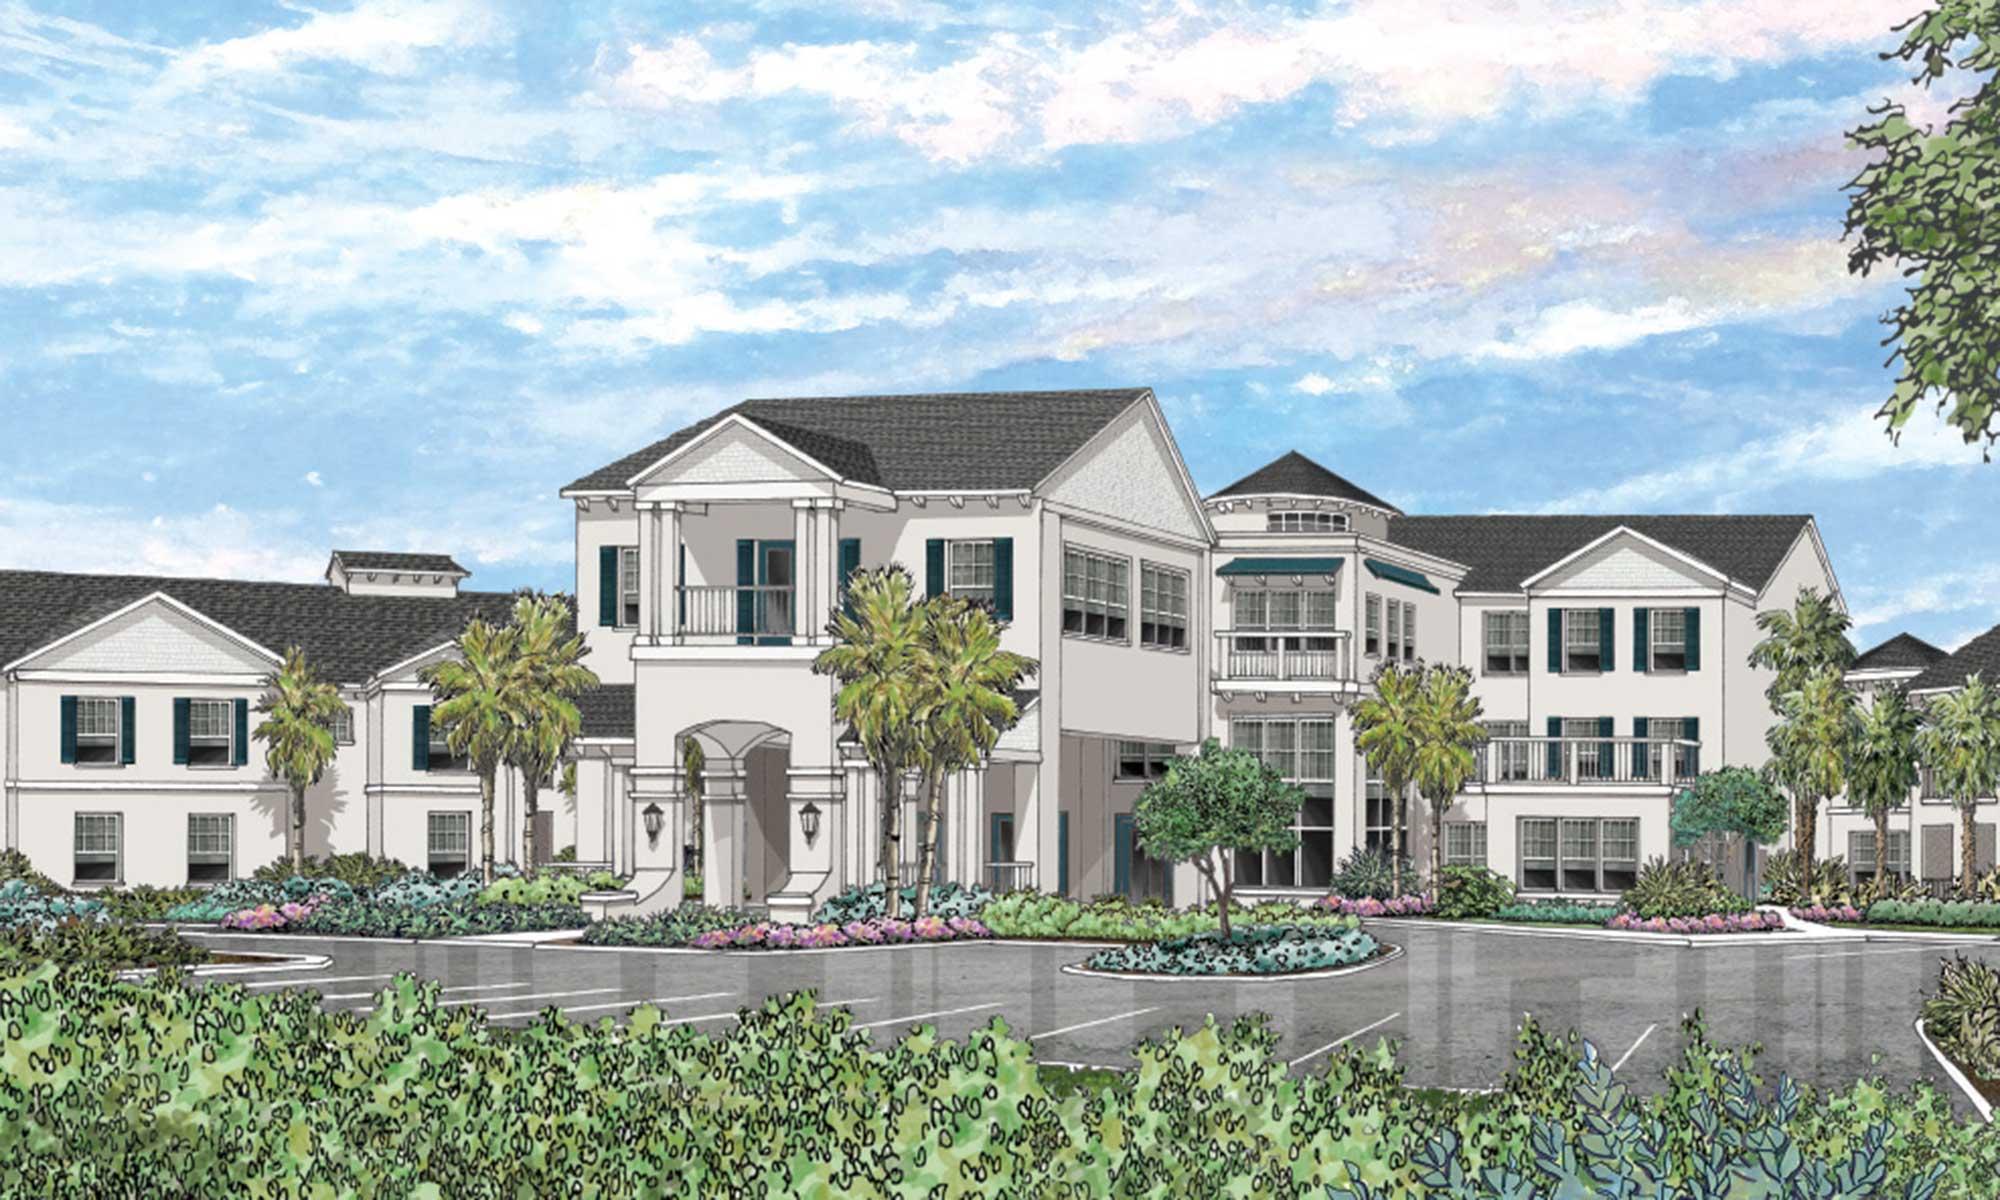 Exquisite senior living facility located in Wildwood